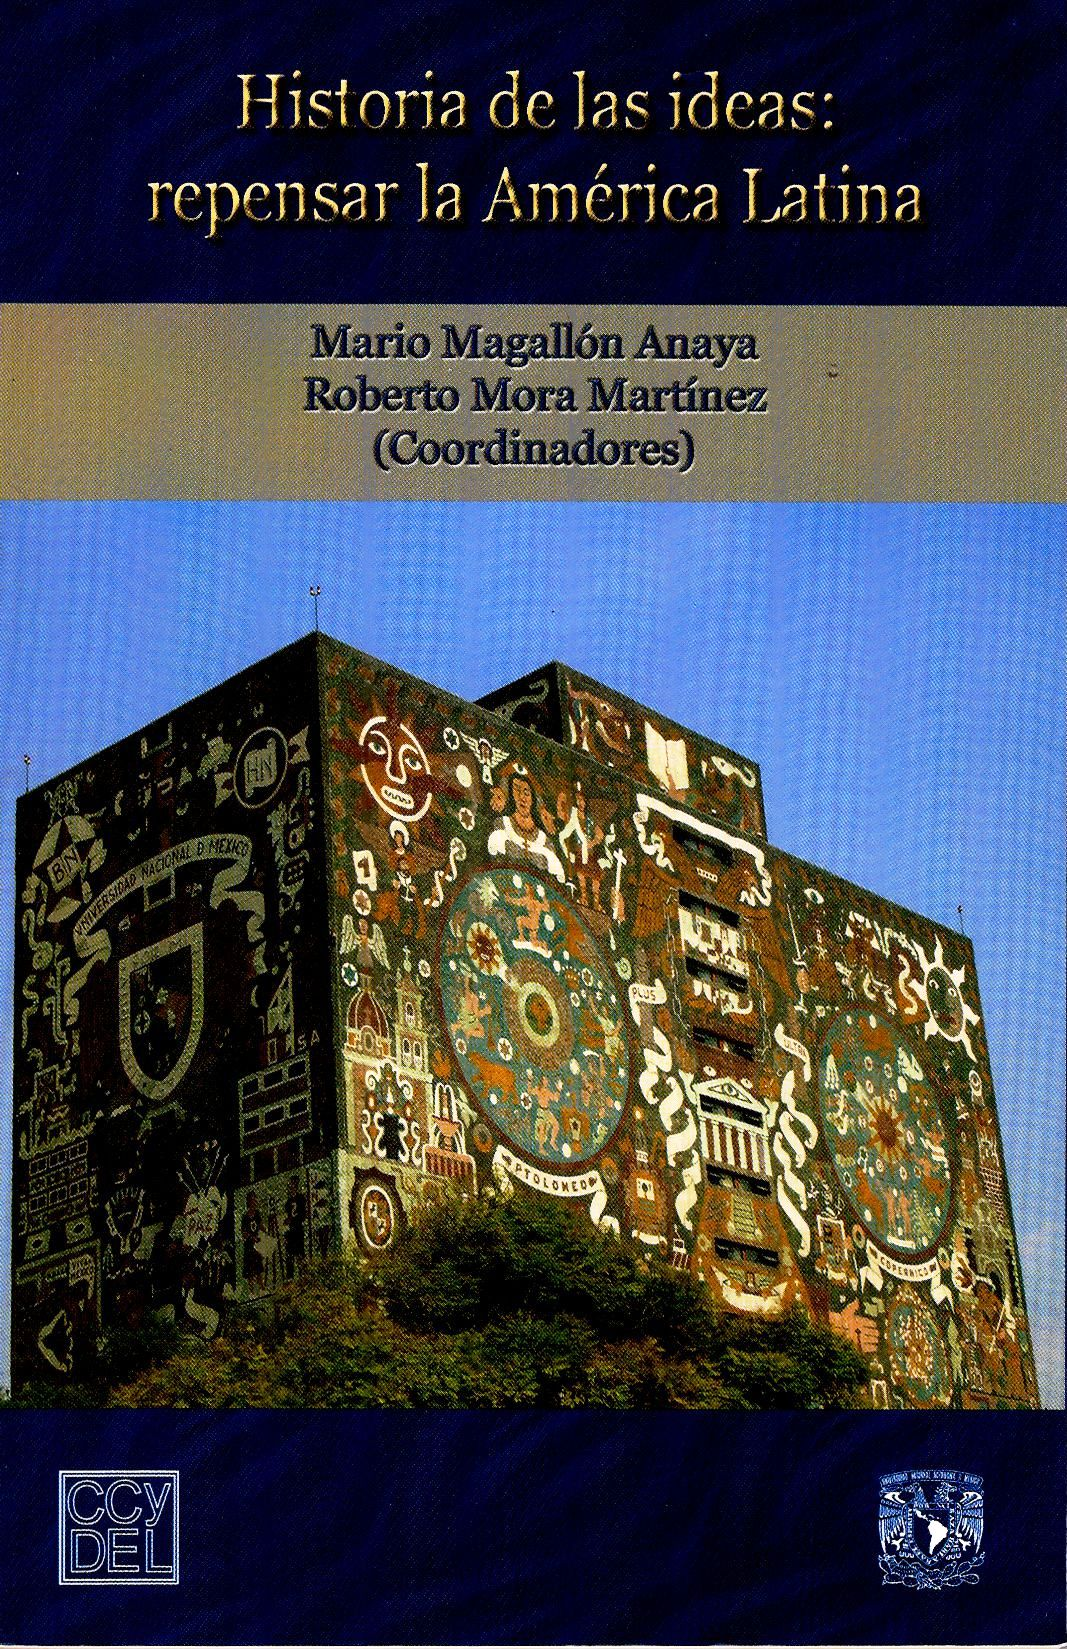 Historia de las ideas: repensar la América Latina